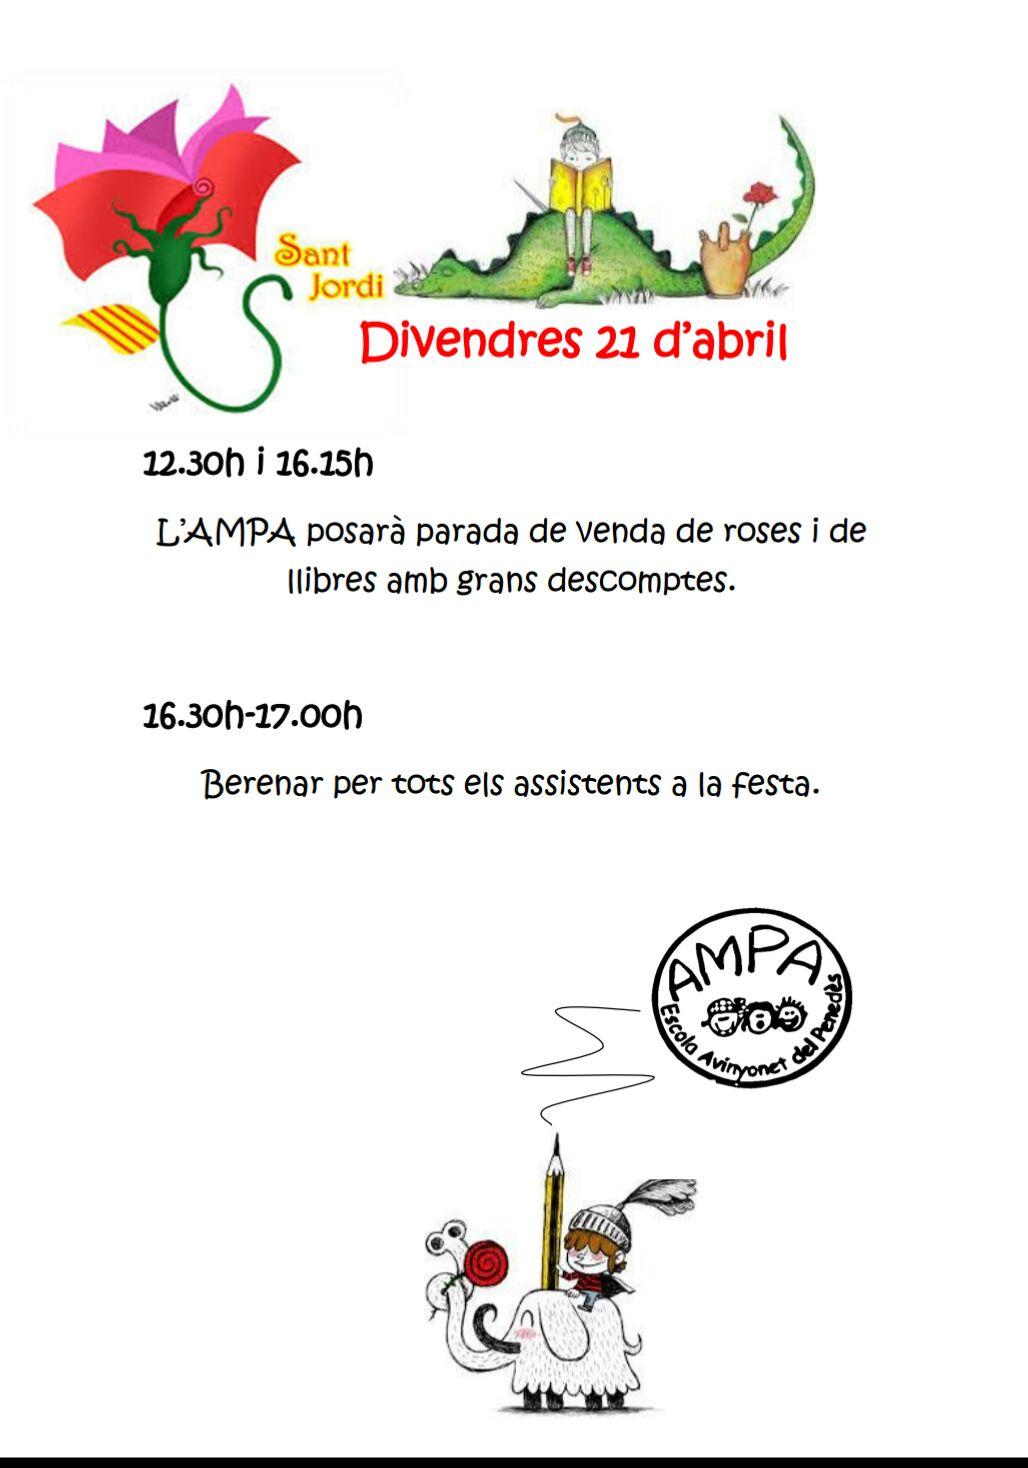 Divendres 21 d'Abril - Sant Jordi 2017 - AMPA Avinyonet